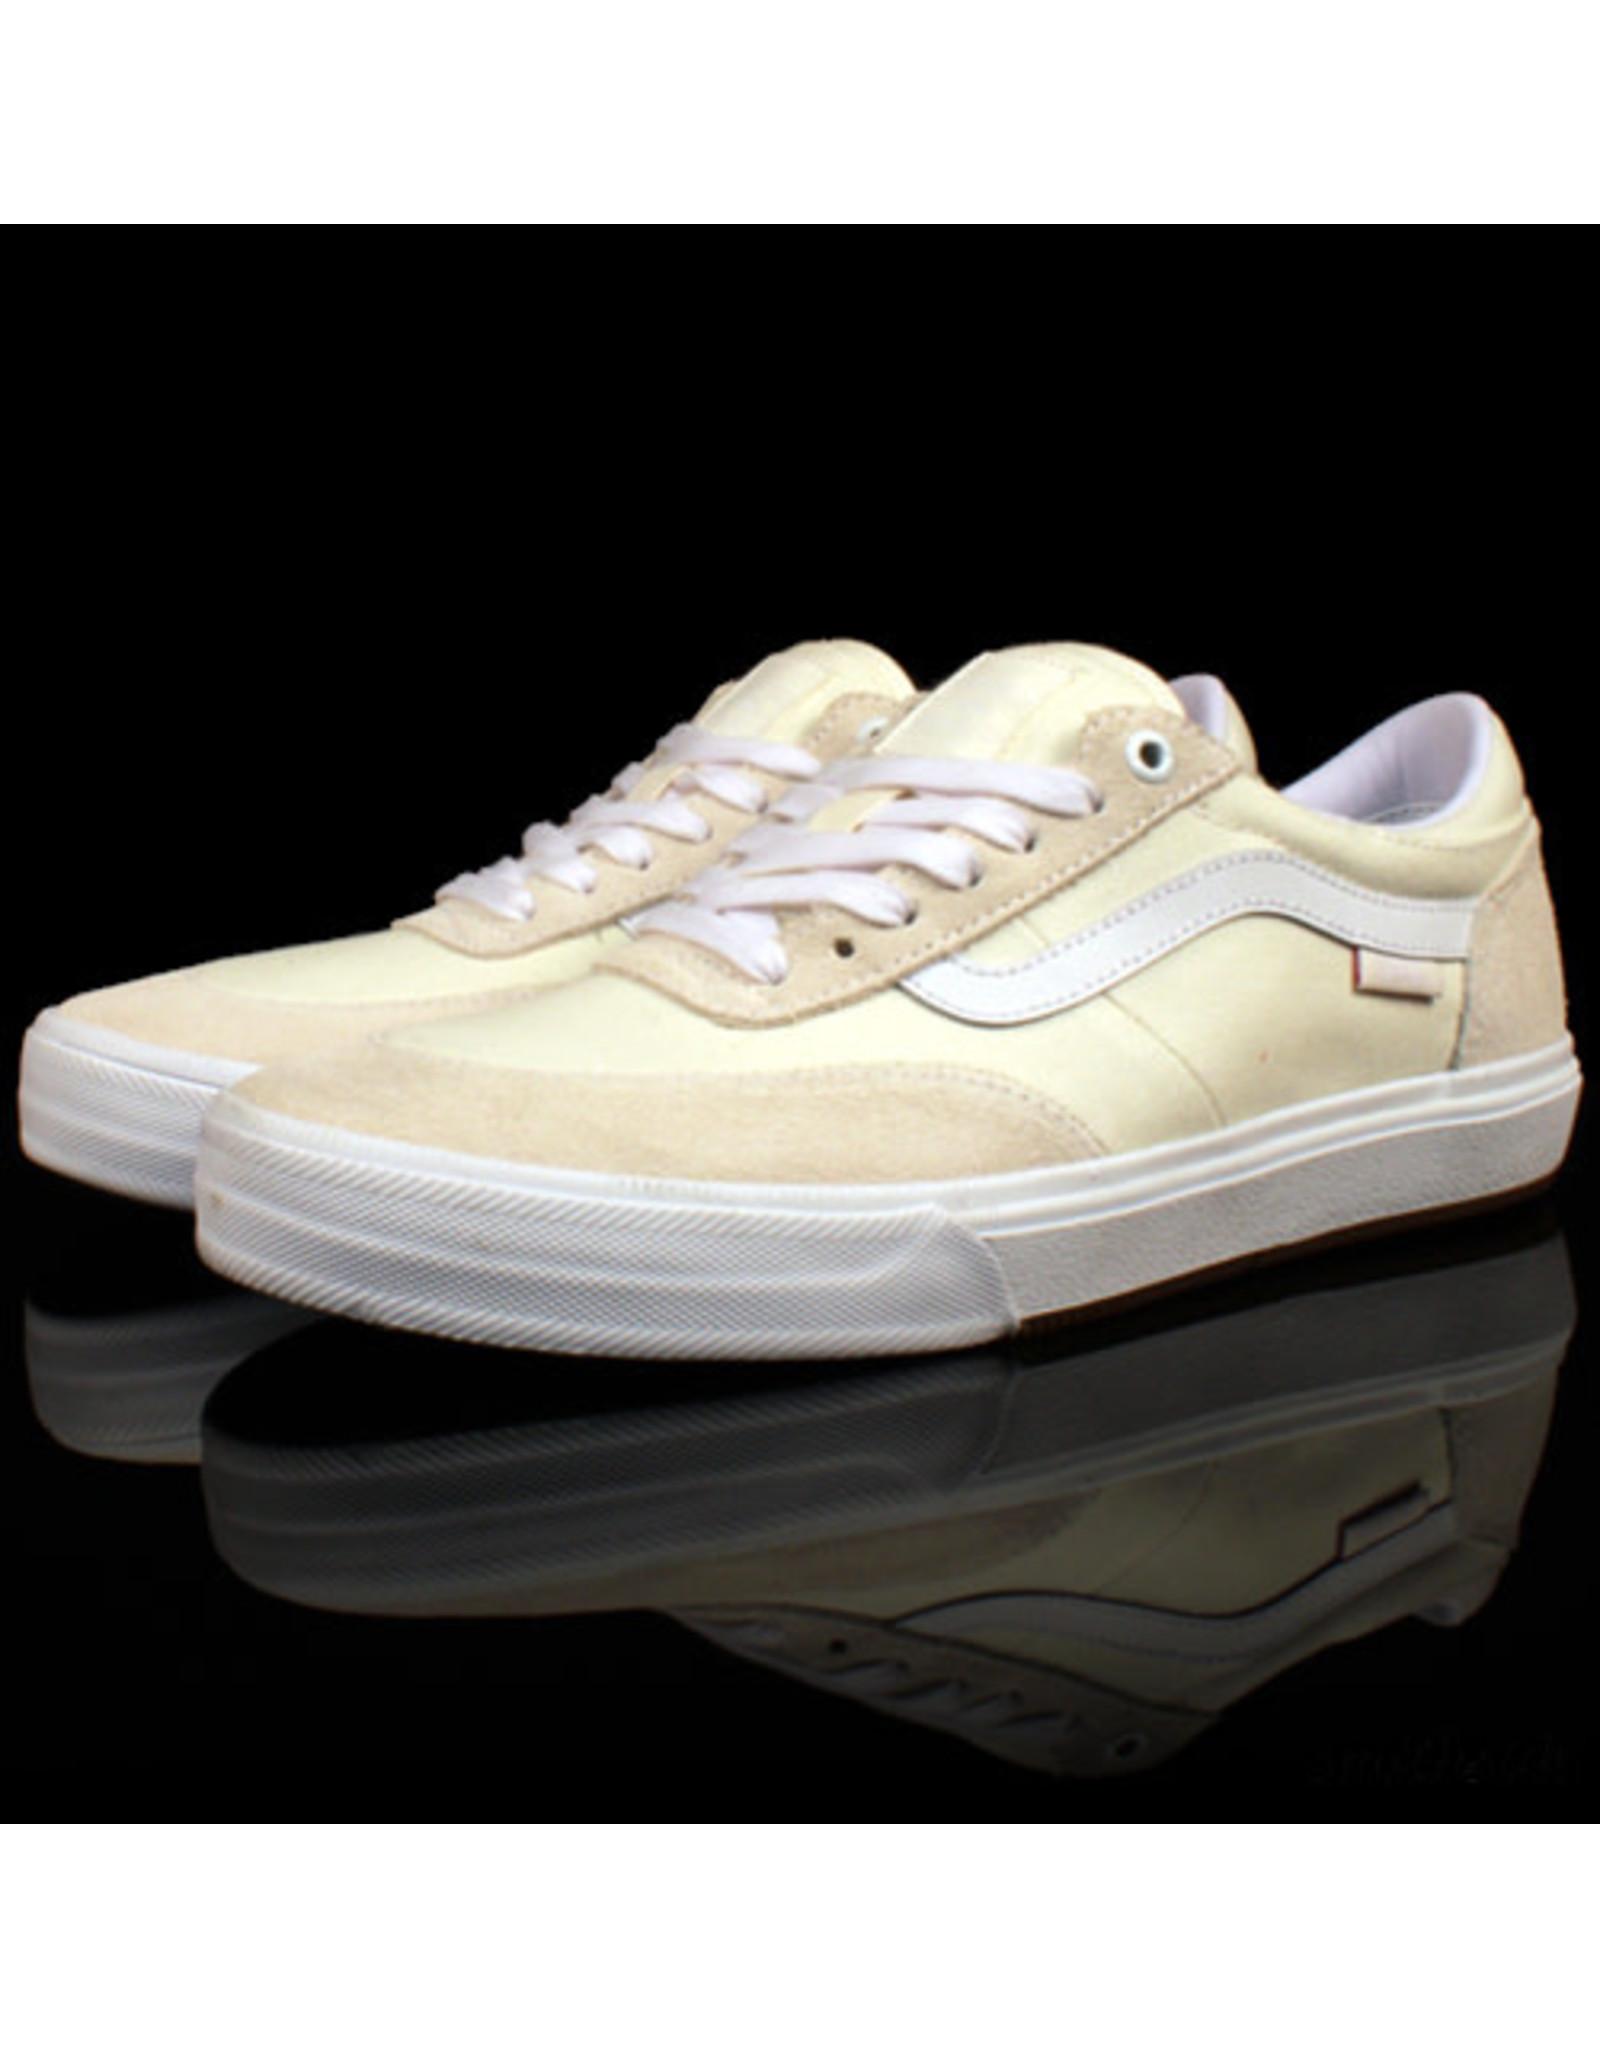 VANS Vans Gilbert Crockett Pro Marshmallow True White